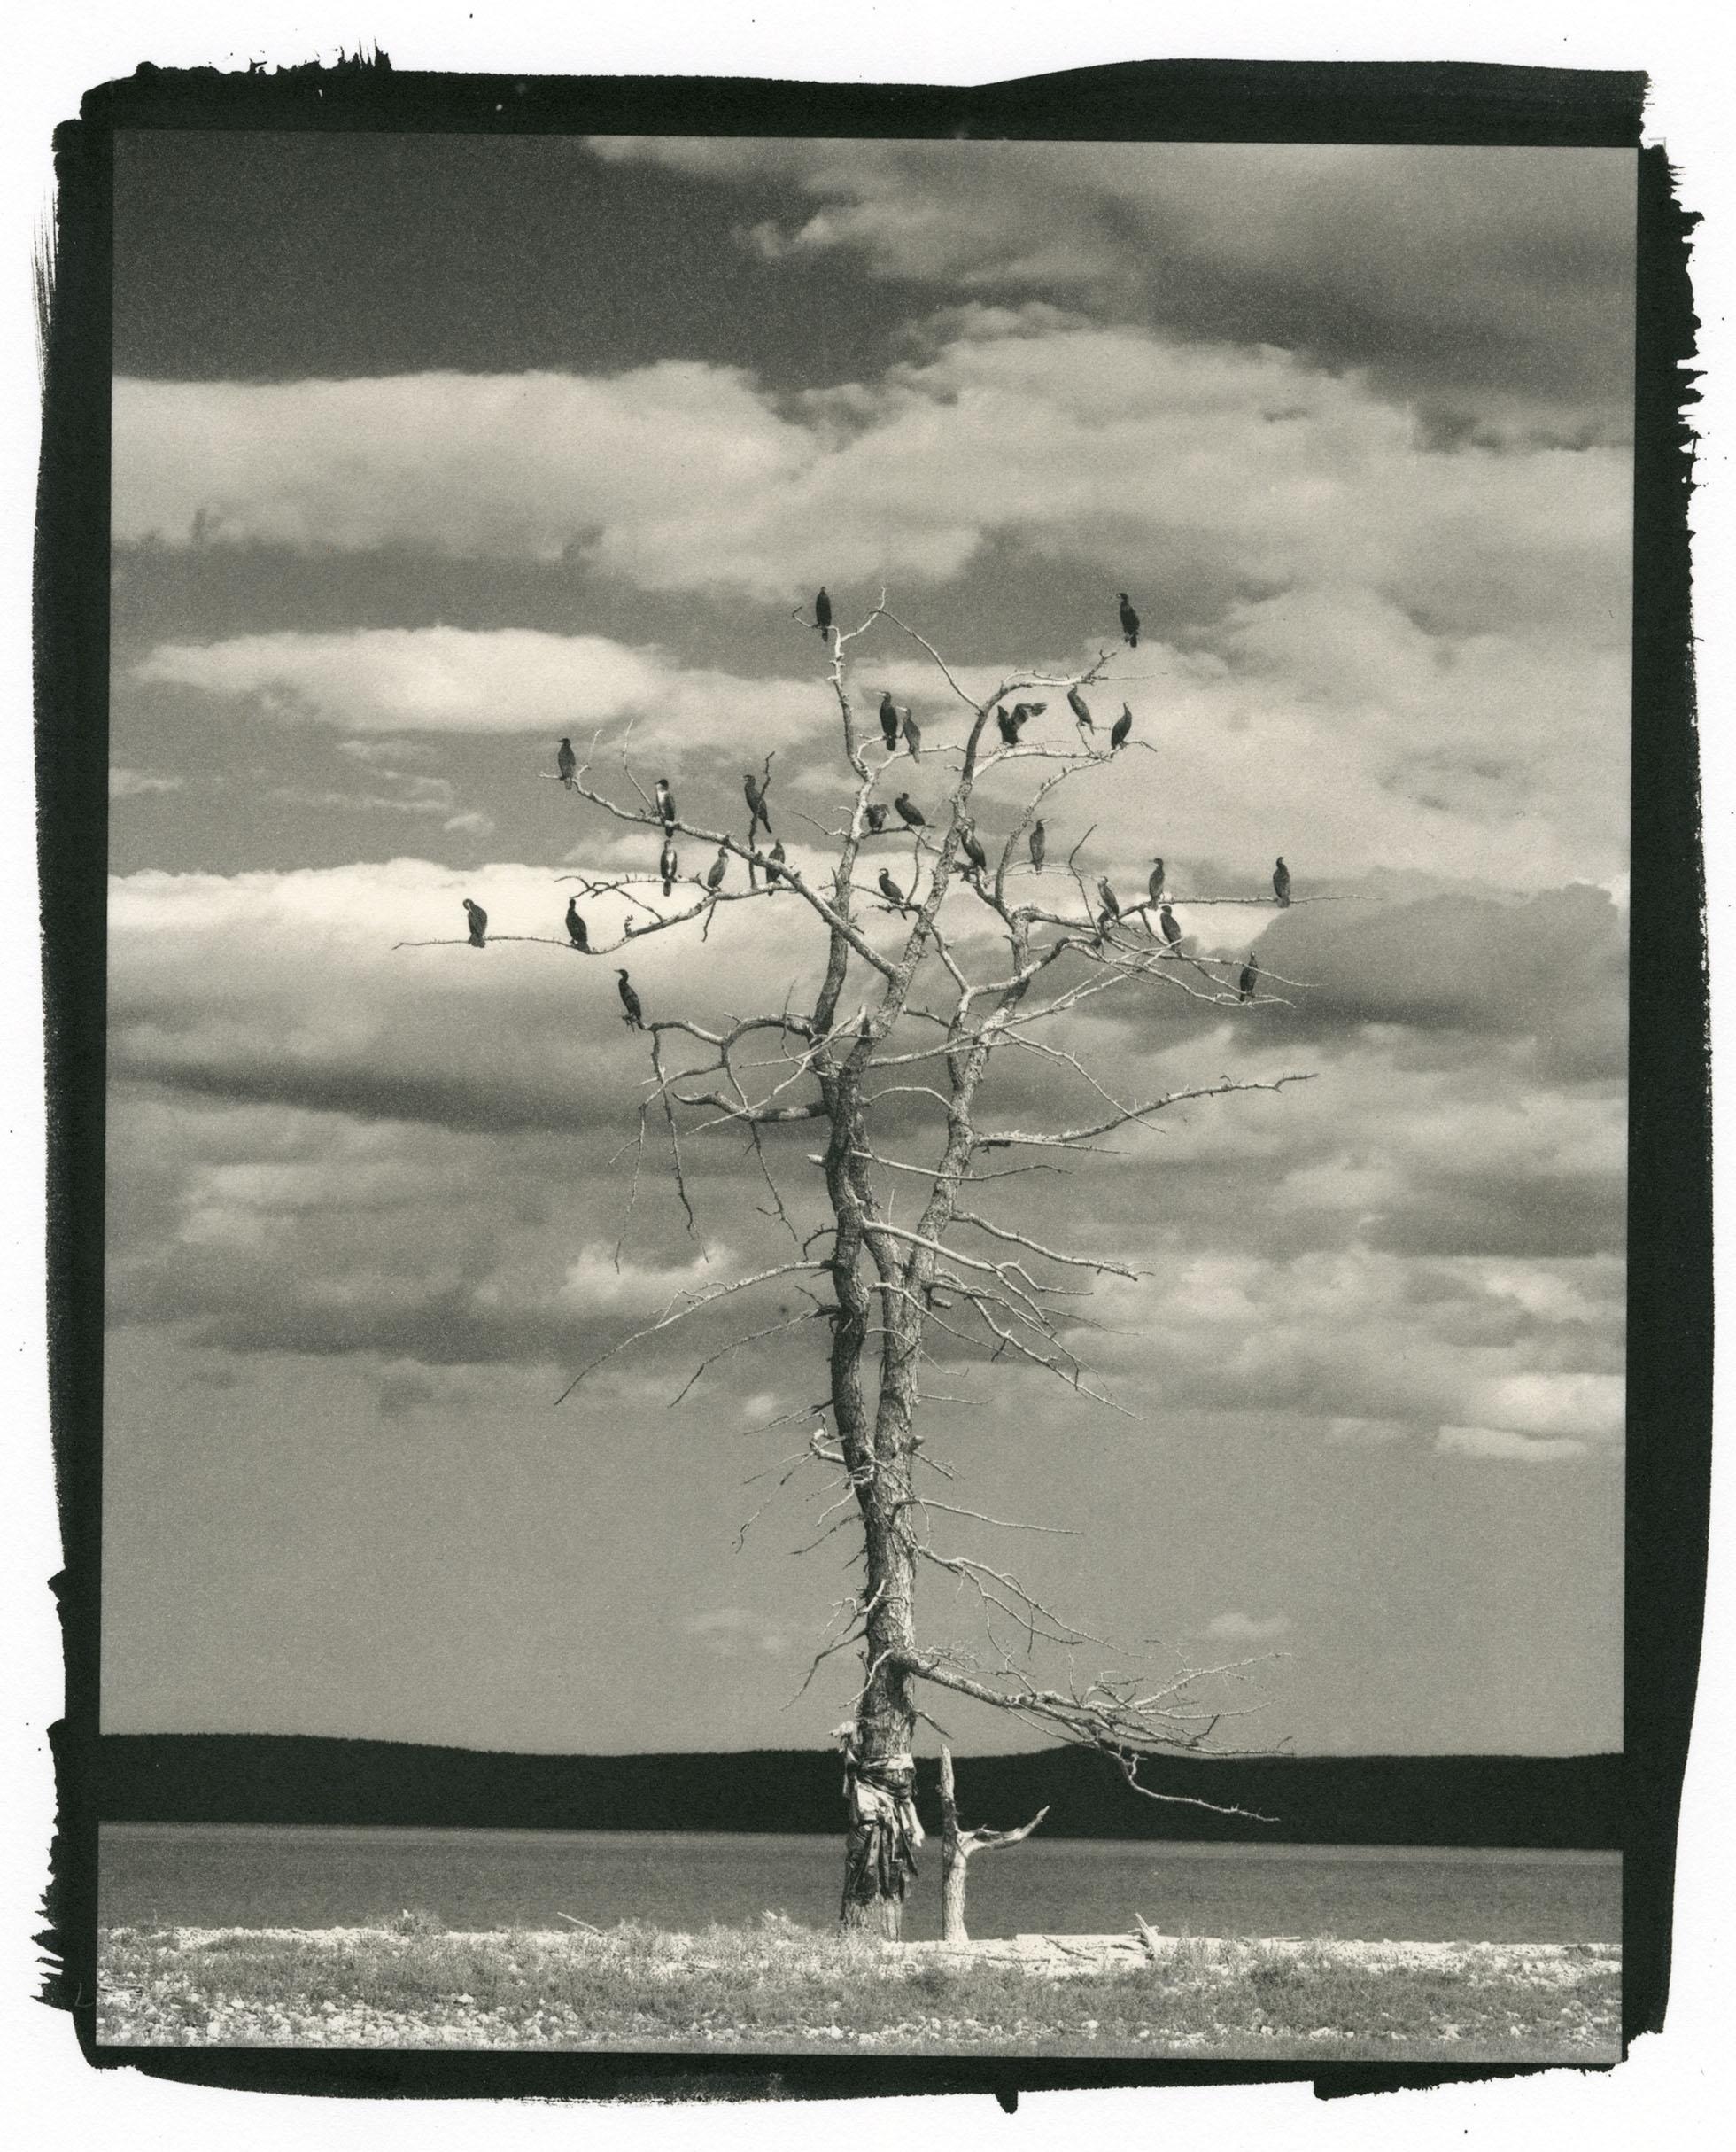 "Lake Hovsgol Tree and Birds, Mongolia  (Platinum/Palladium Print, 8 x 10"")"